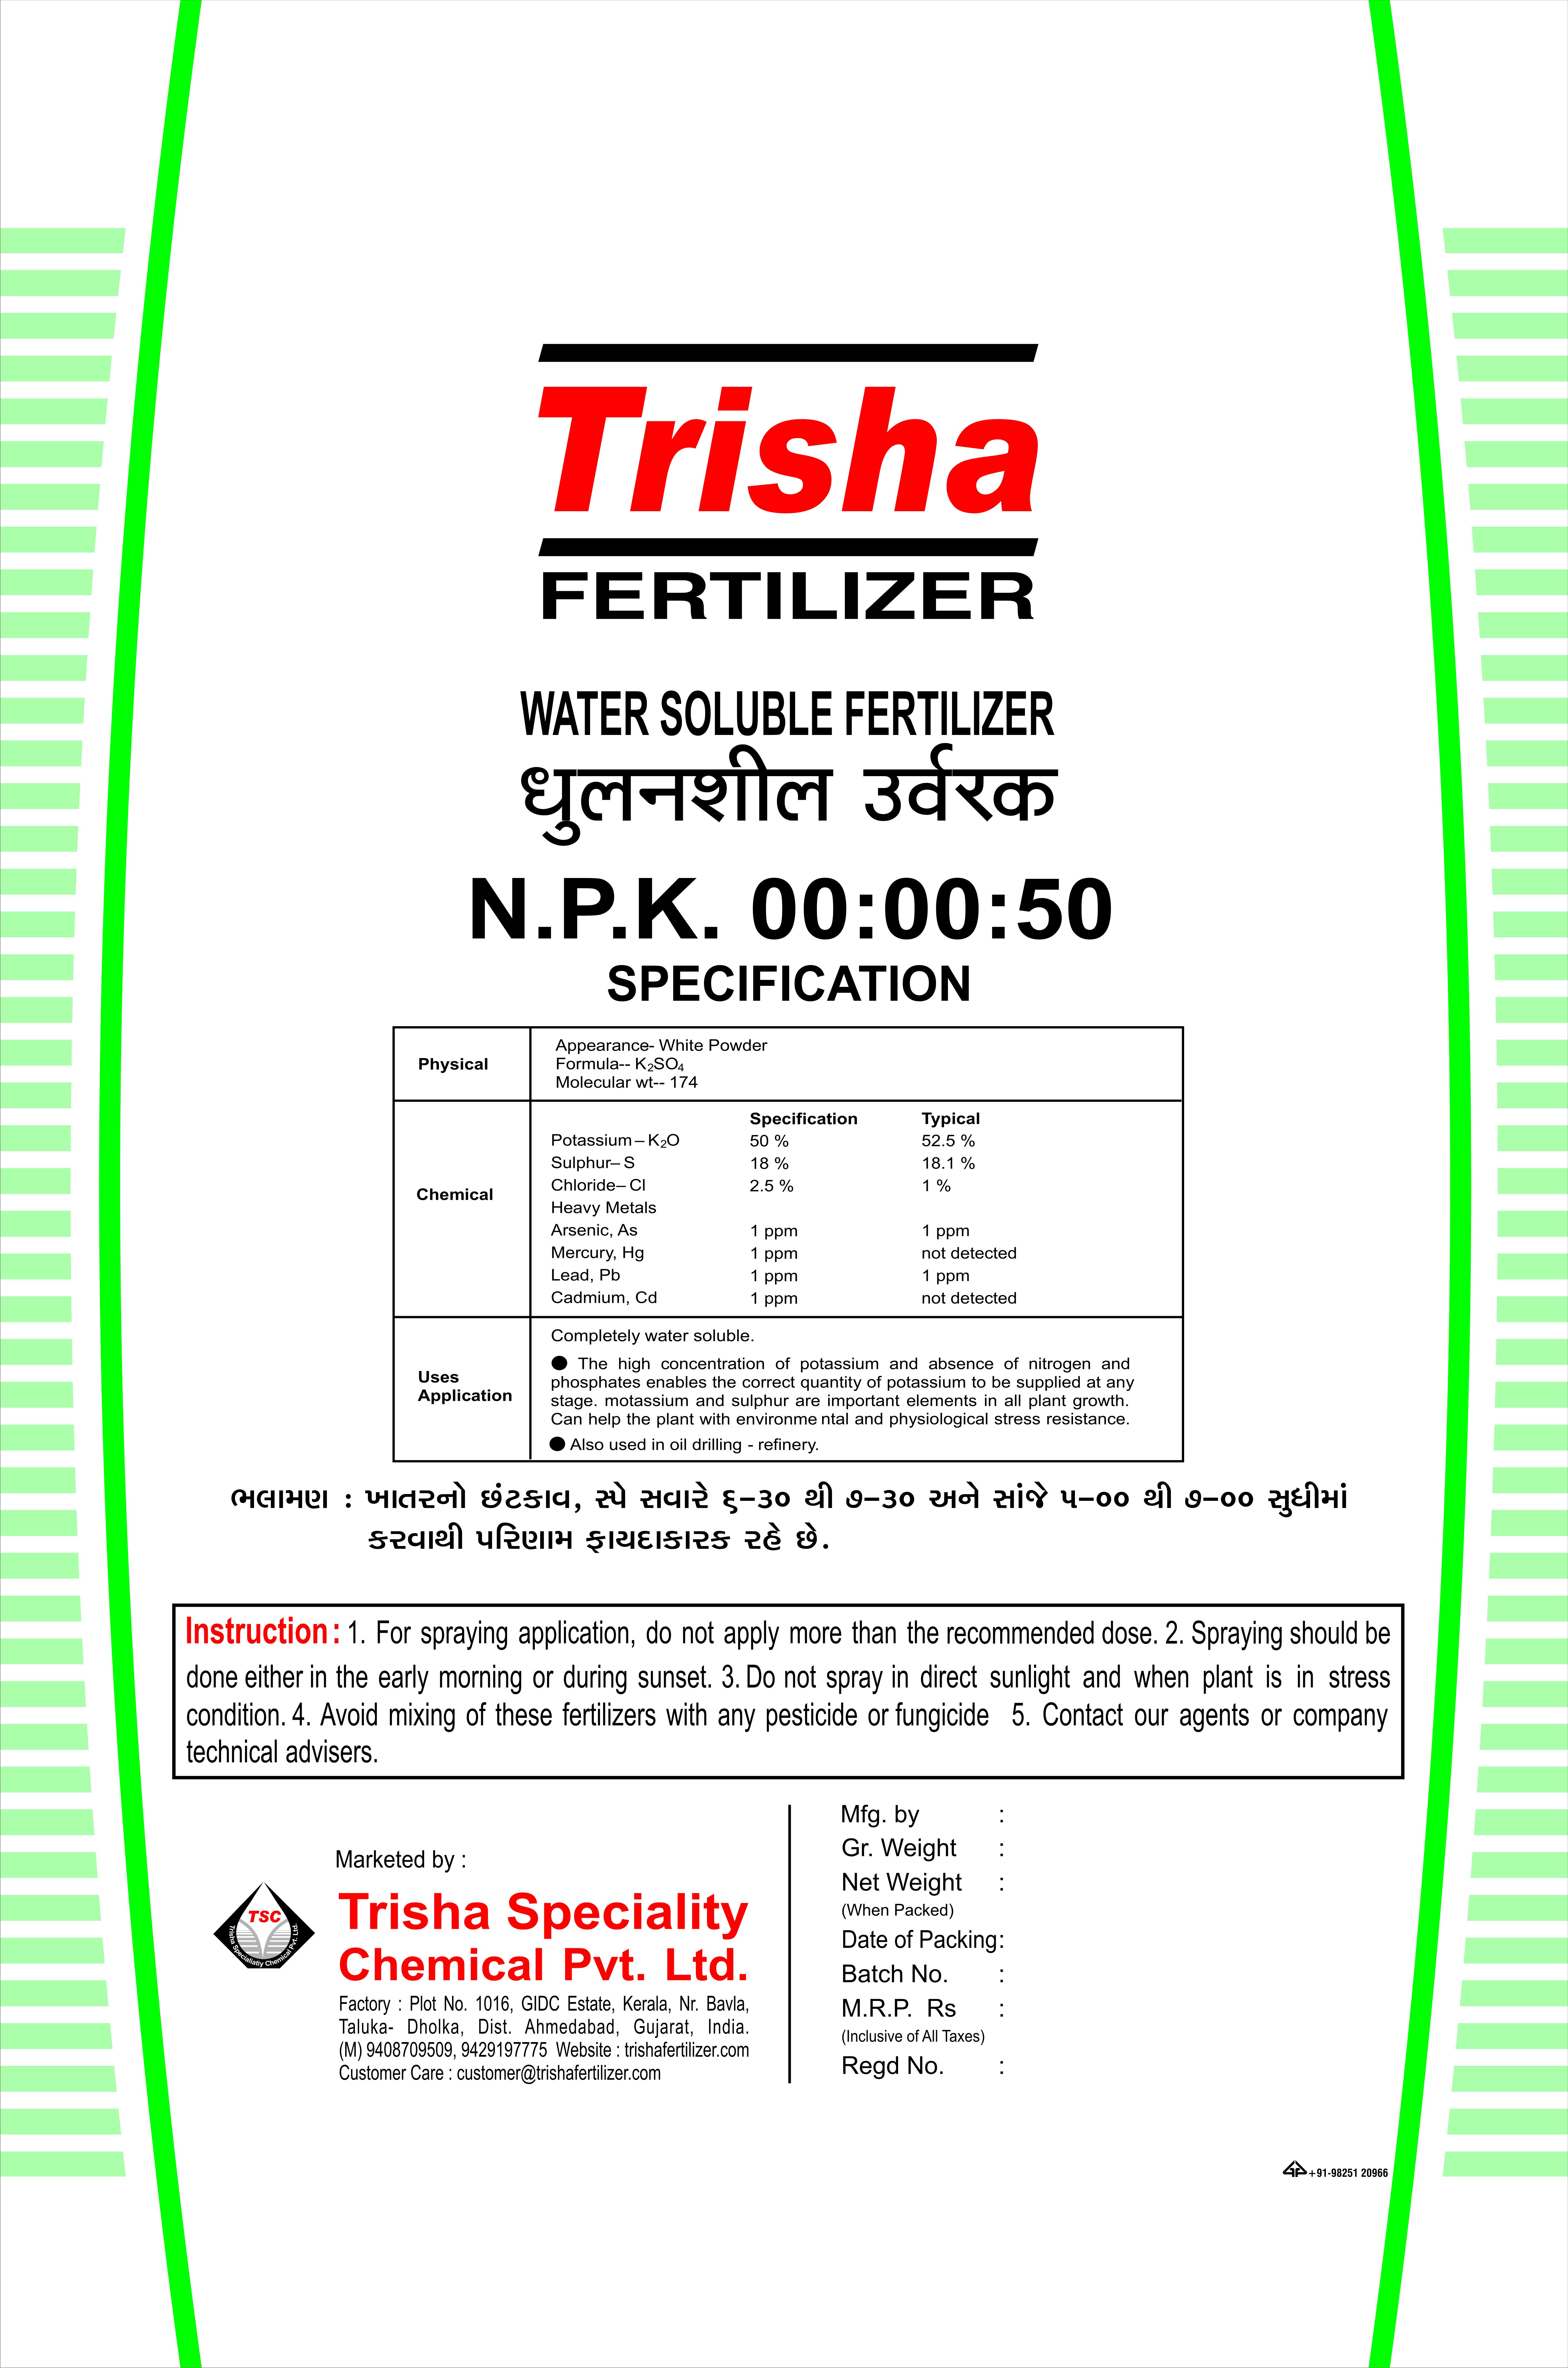 TRISHA SPECIALITY CHEMICALS PVT LTD